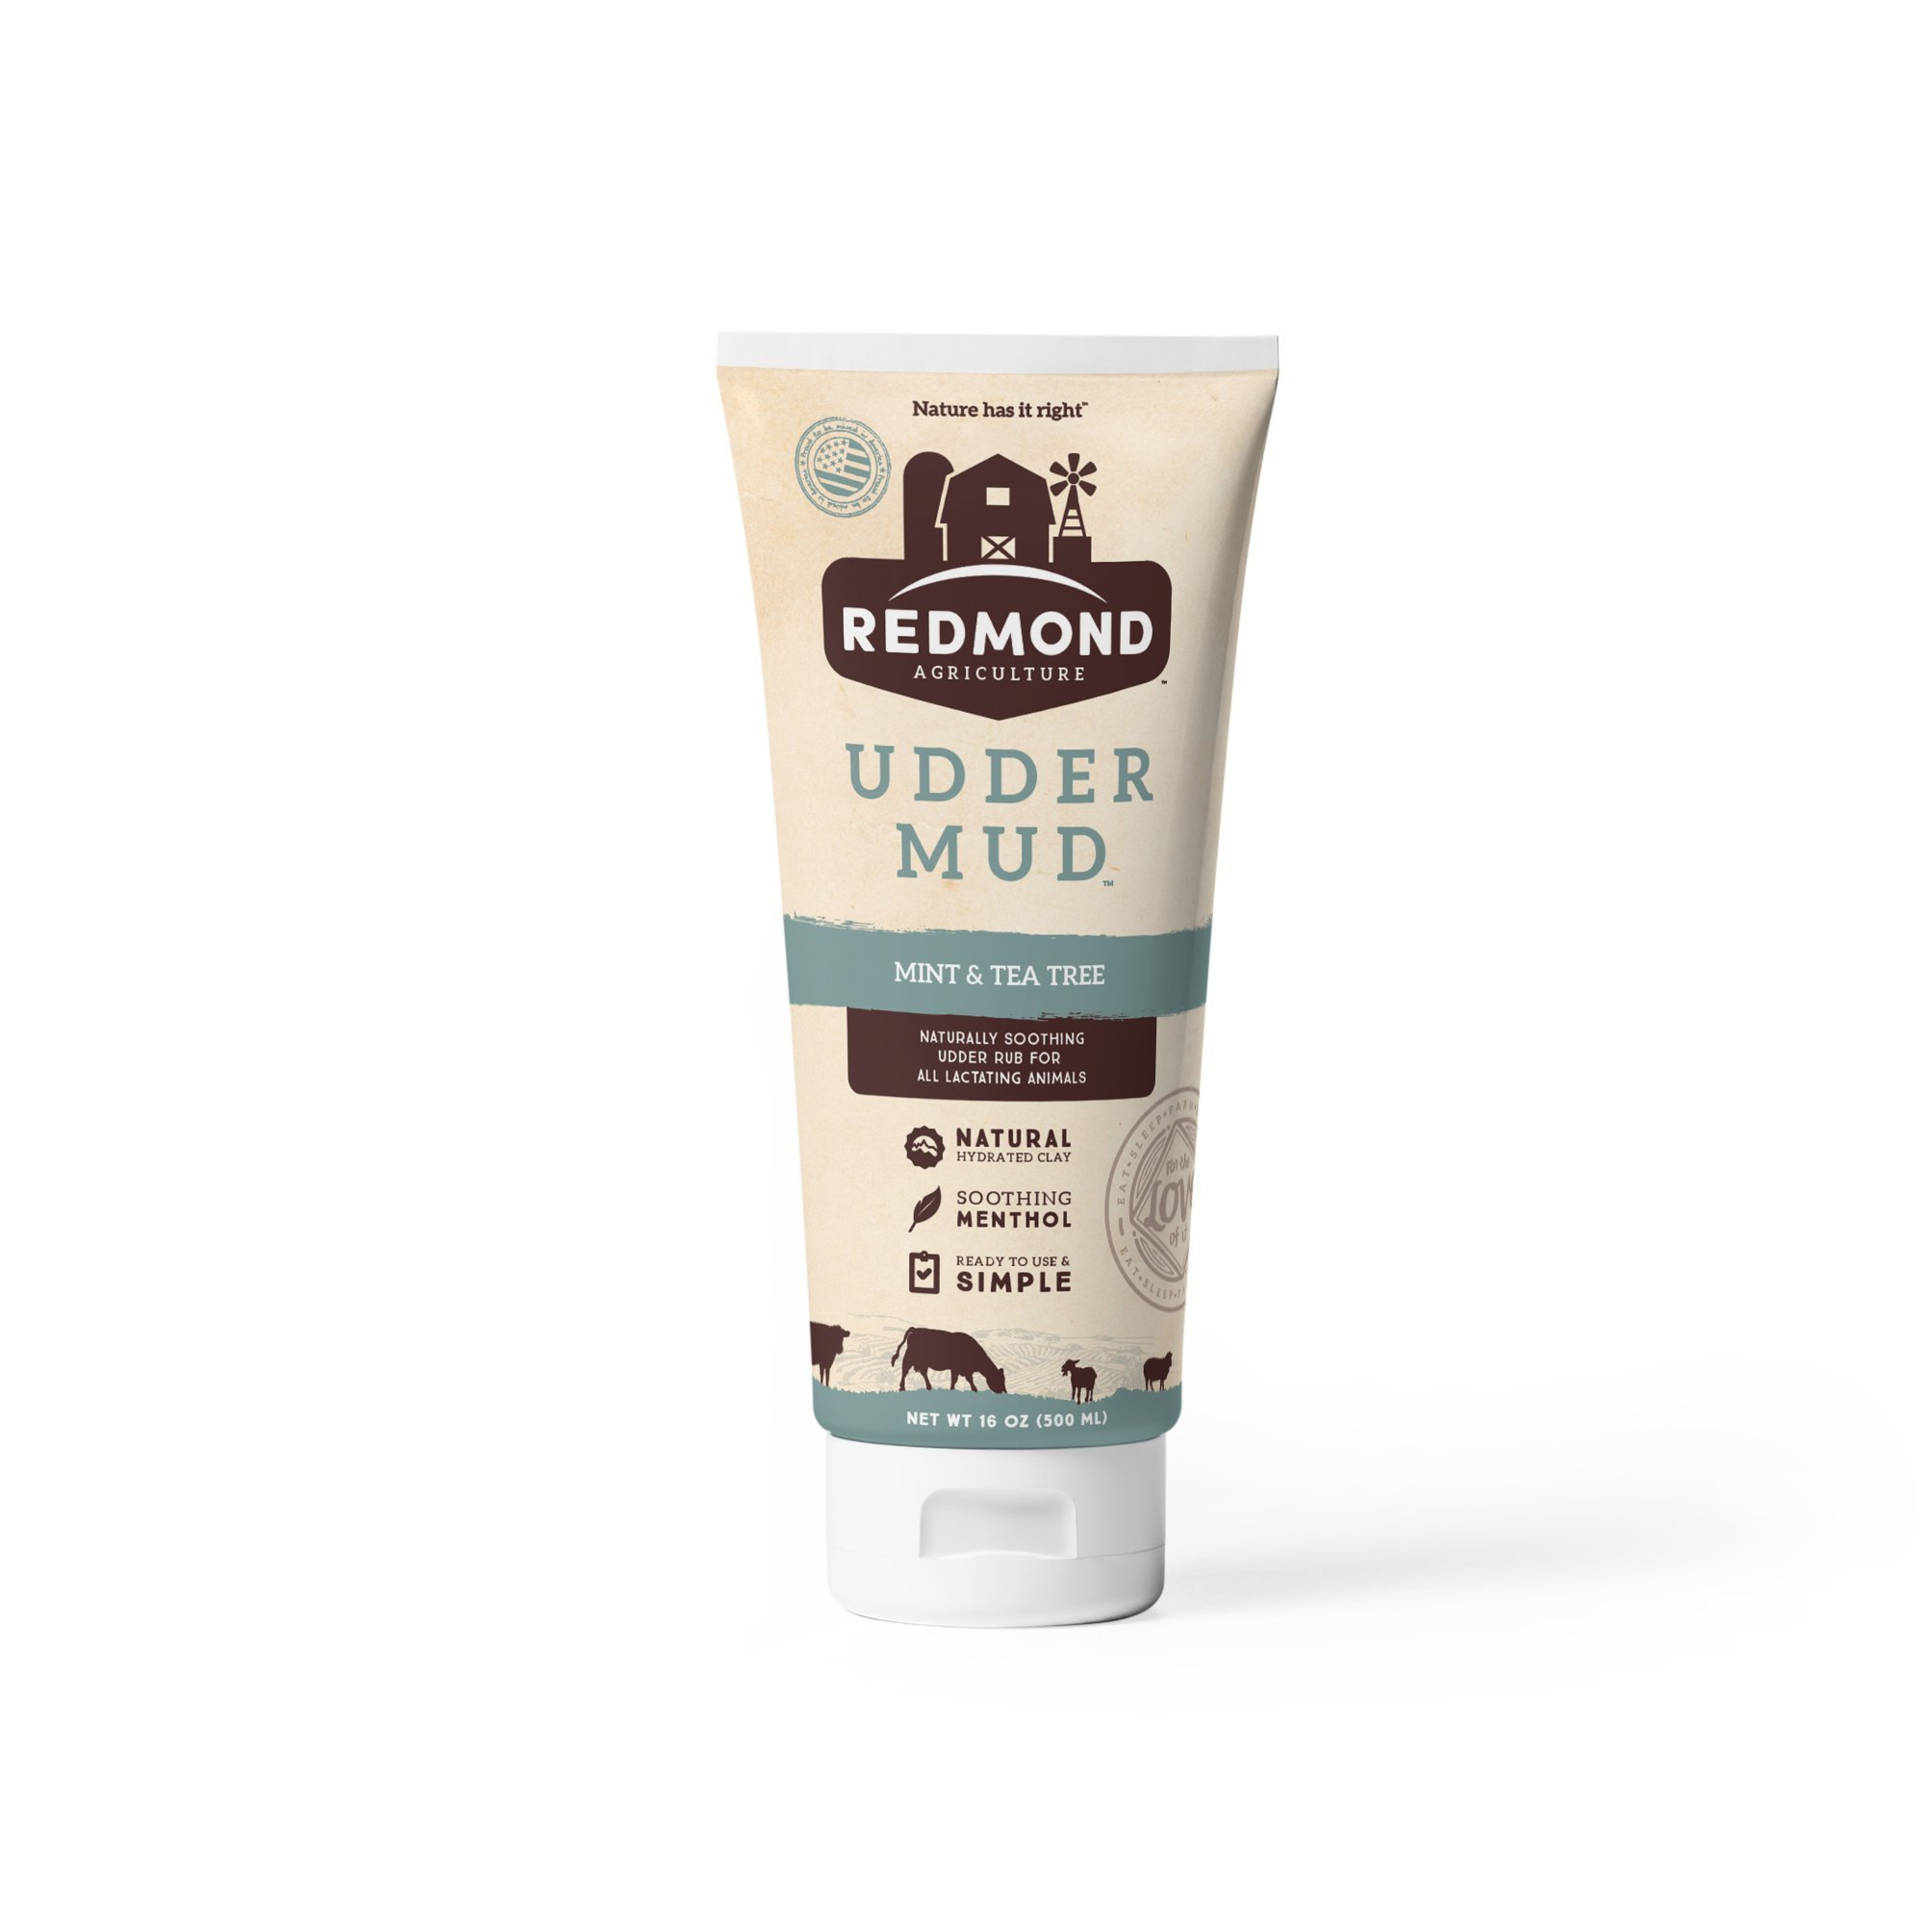 Redmond - Udder Mud Organic Livestock Ointment Rub Care Lotion (16 oz)